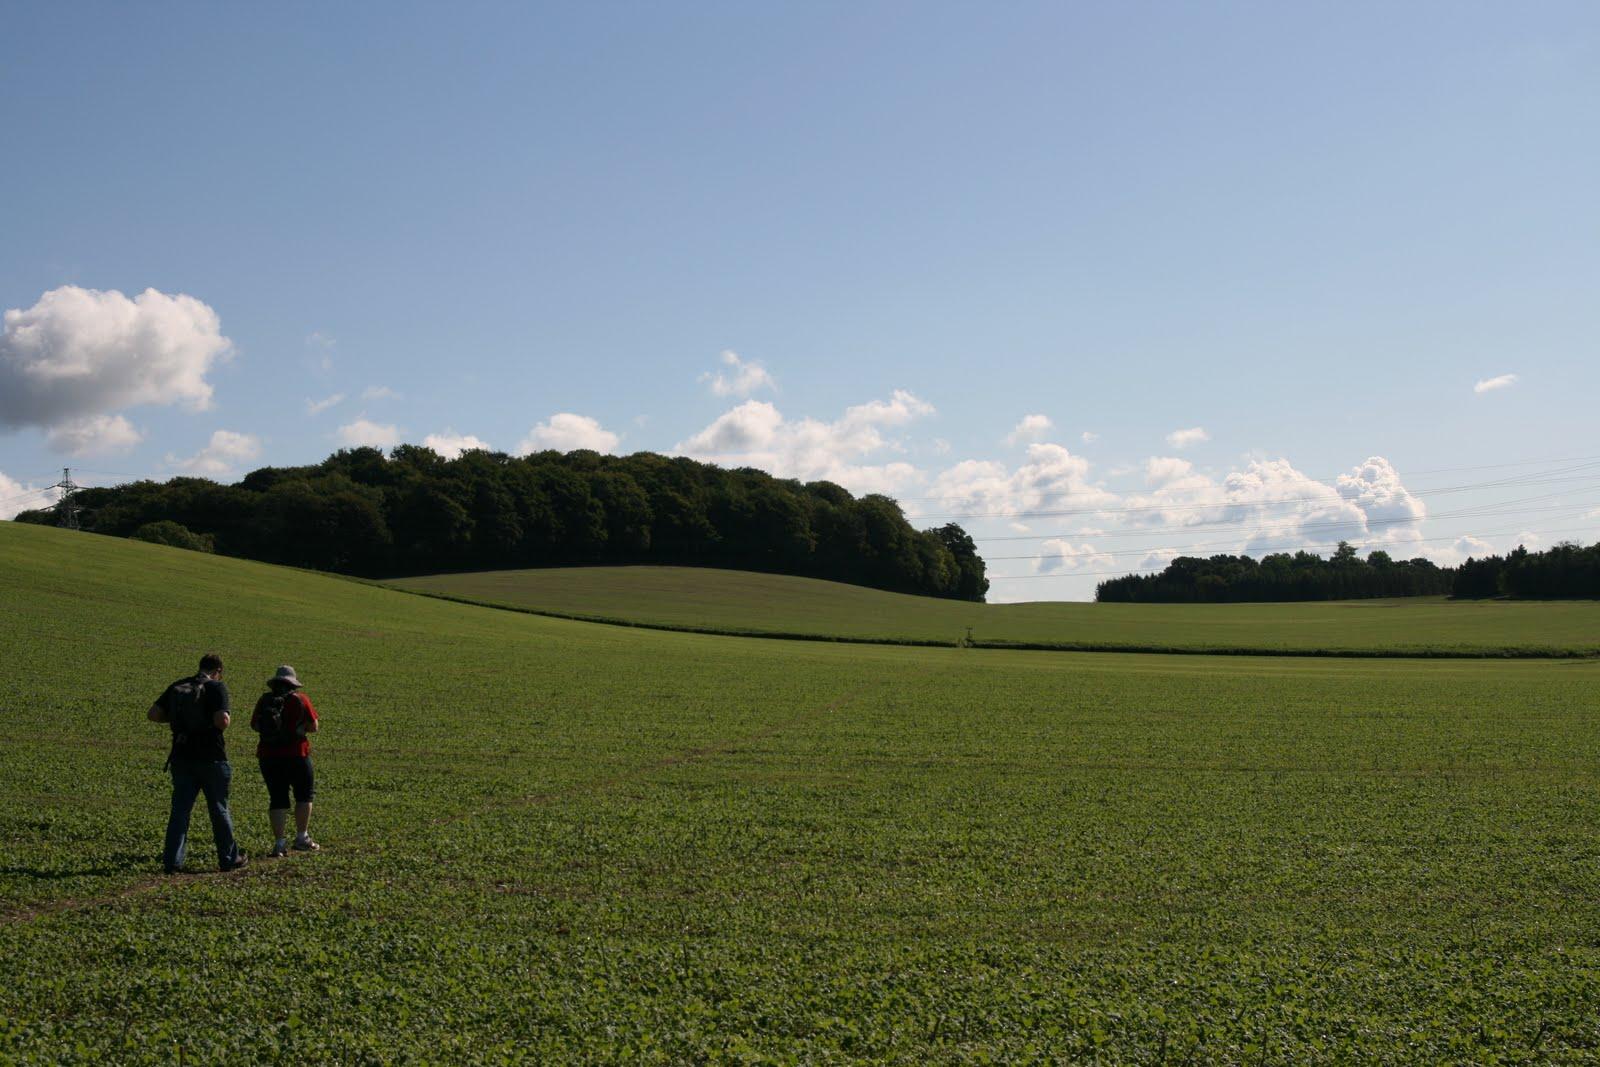 1008 067 Alton Circular, Hampshire, England Across the harvested fields